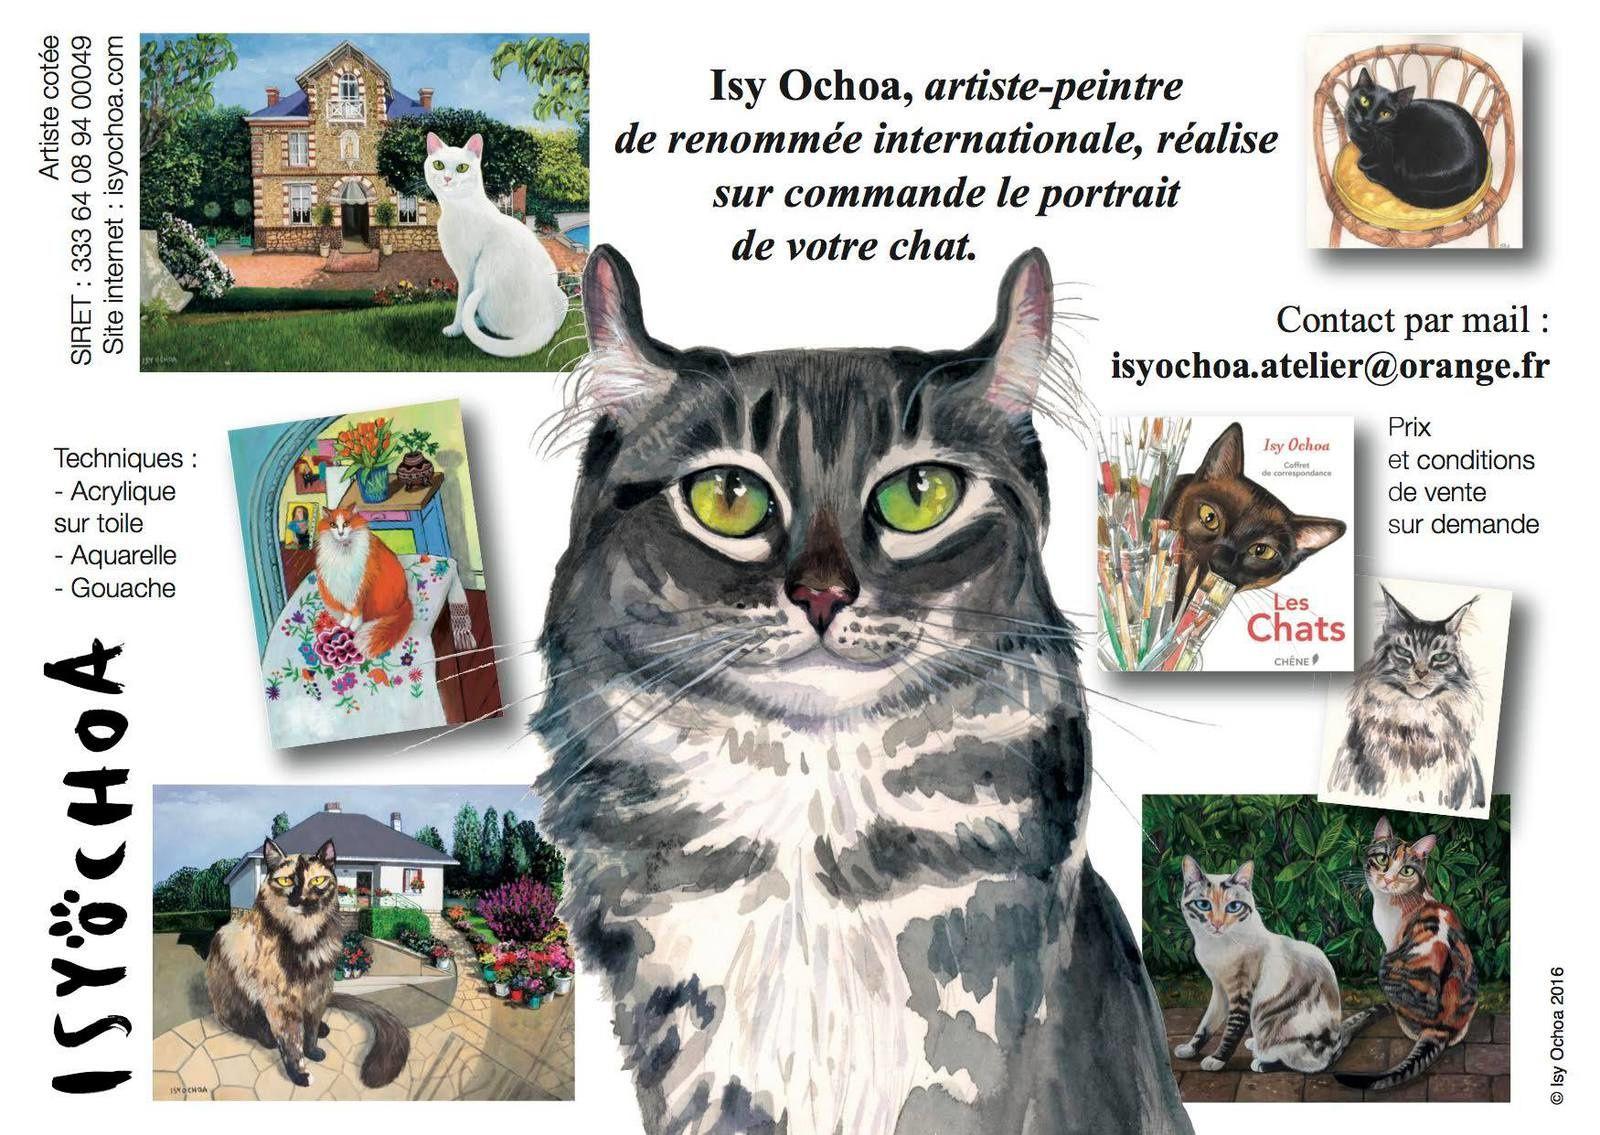 Isy Ochoa, portraits de chats